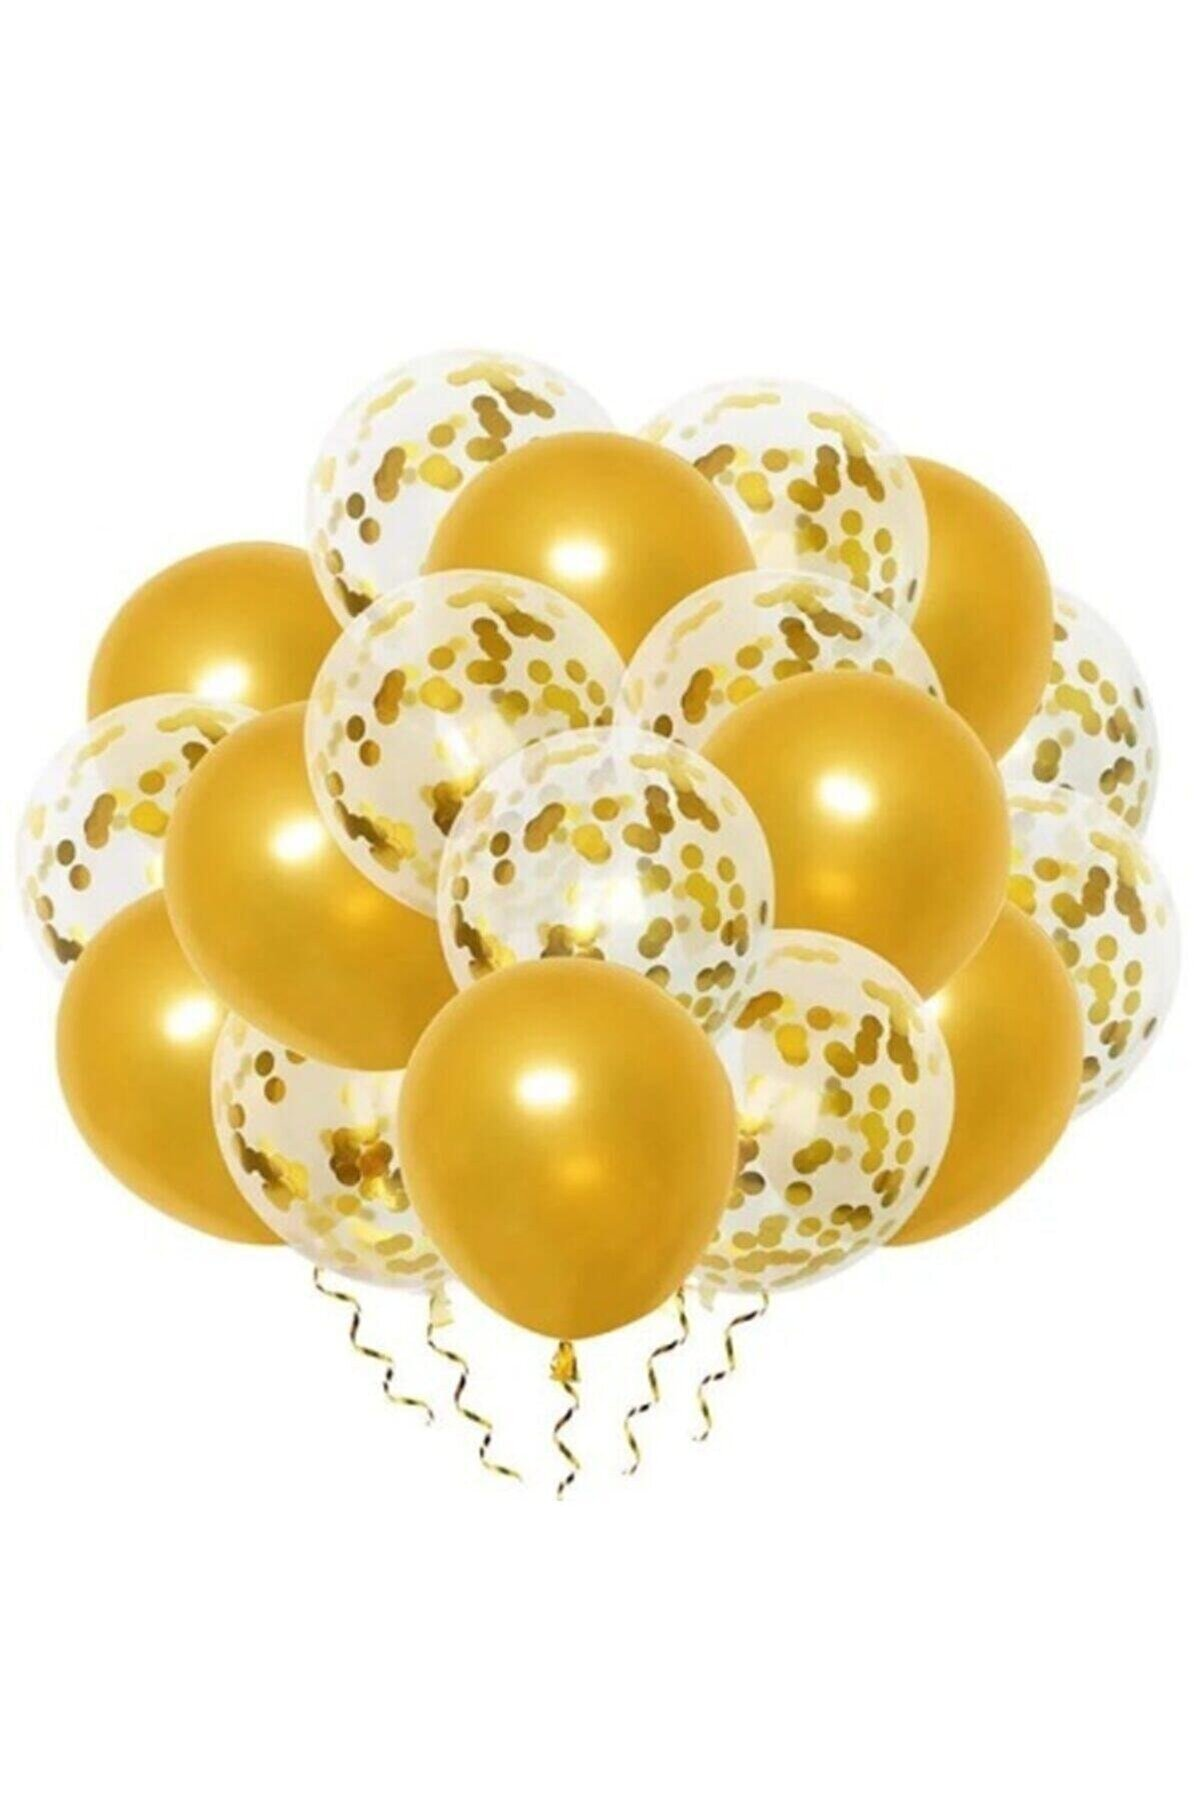 Deniz Party Store Gold Konfetili Şeffaf Balon Ve Metalik Gold Balon Seti 20 Adet